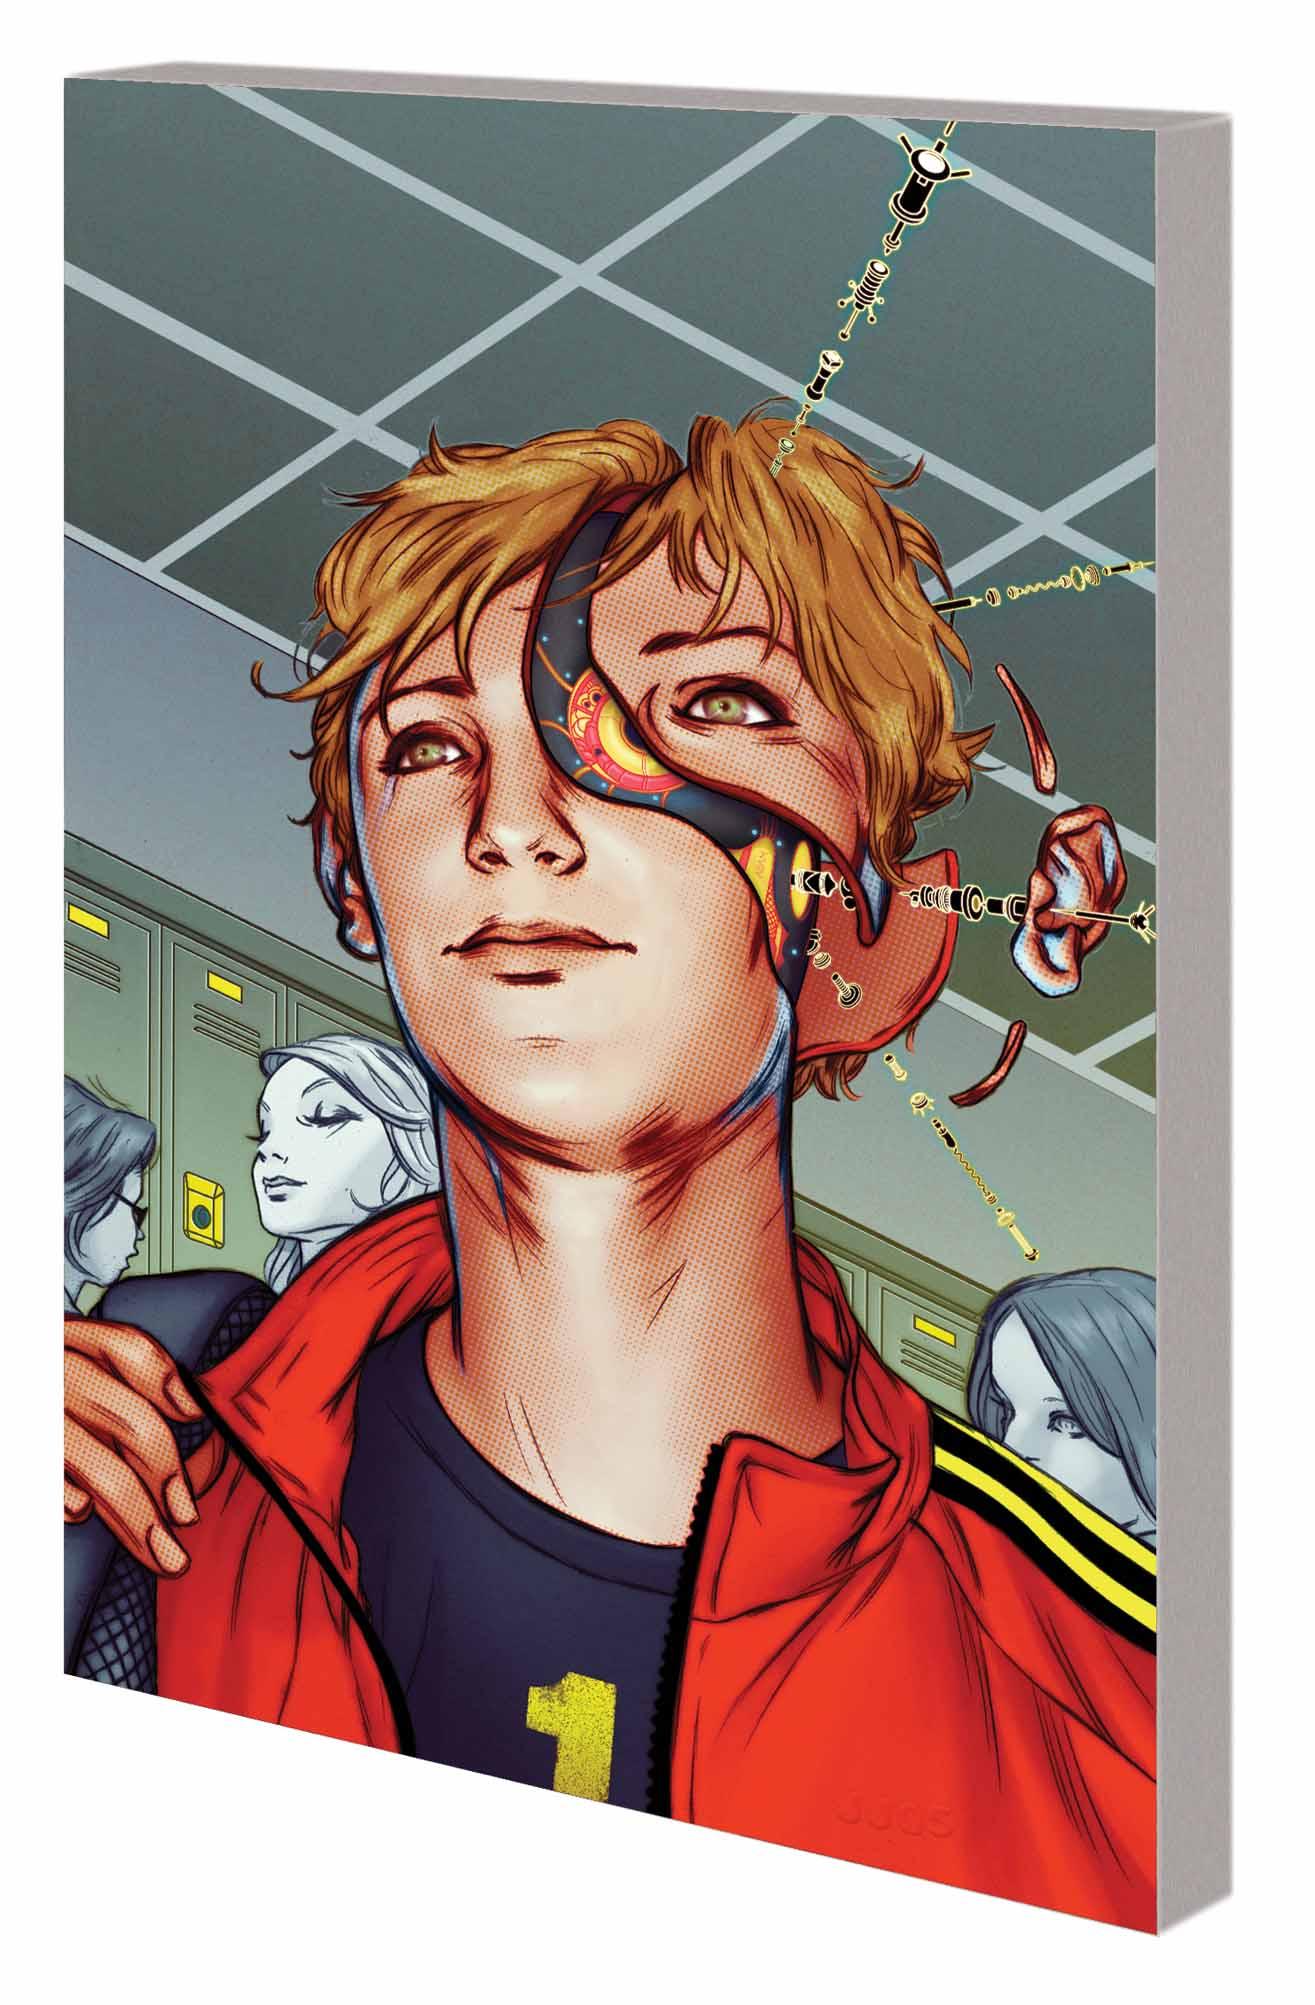 Machine Teen: History 101001 (Trade Paperback)